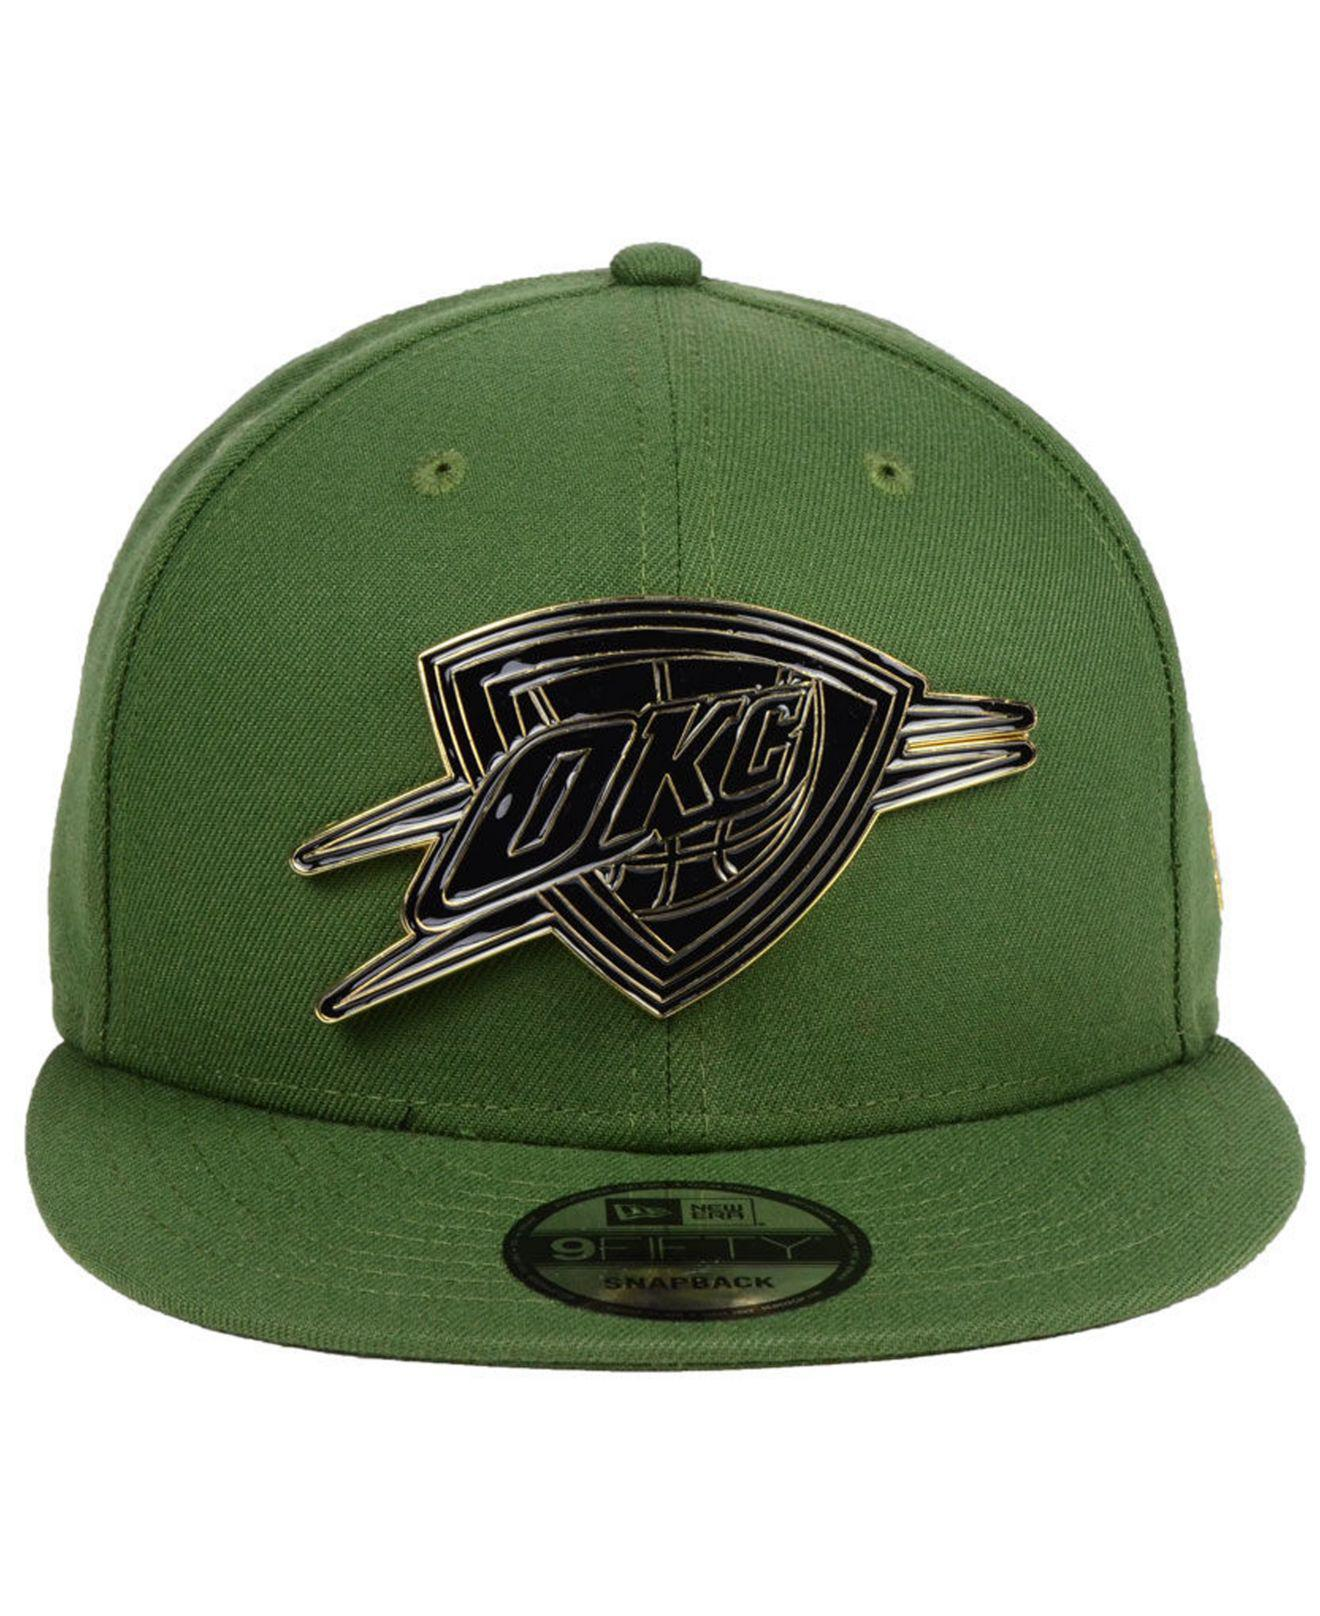 sports shoes d4b49 e7205 Lyst - KTZ Oklahoma City Thunder Enamel Badge 9fifty Snapback Cap in Green  for Men